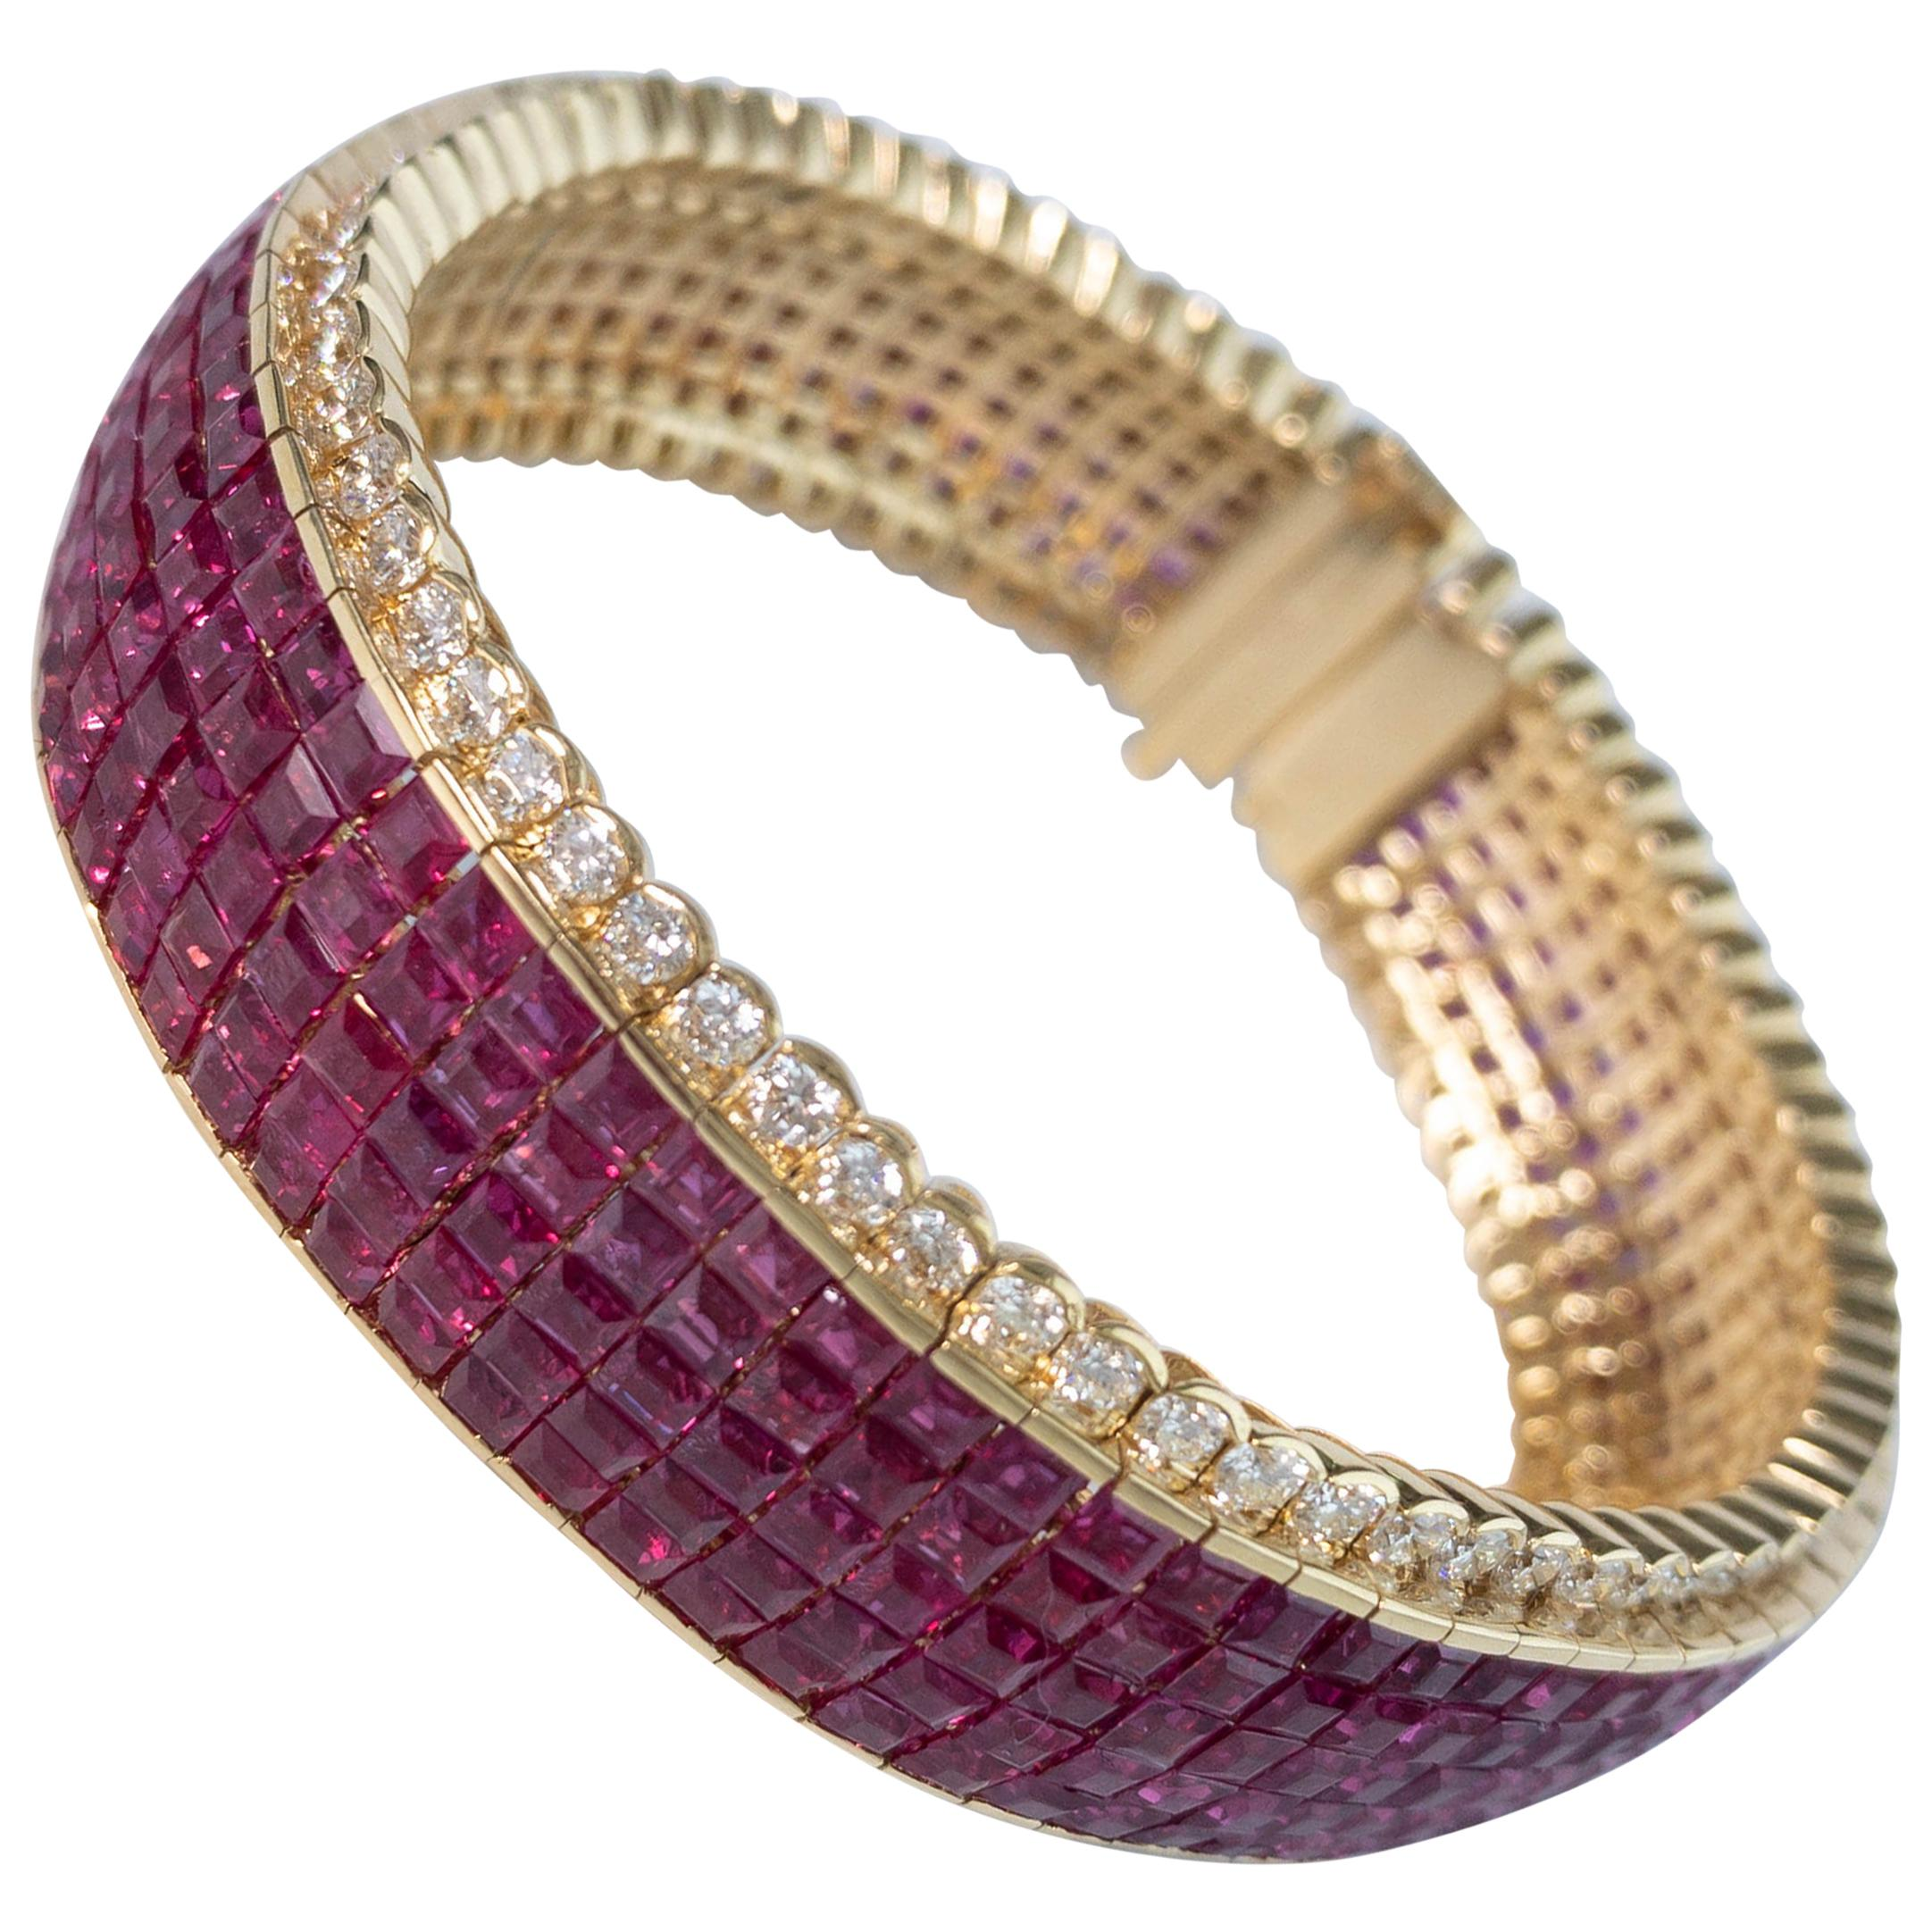 33 Carat Ruby and 4 Carat Diamond Invisible Bracelet in 18 Karat Yellow Gold